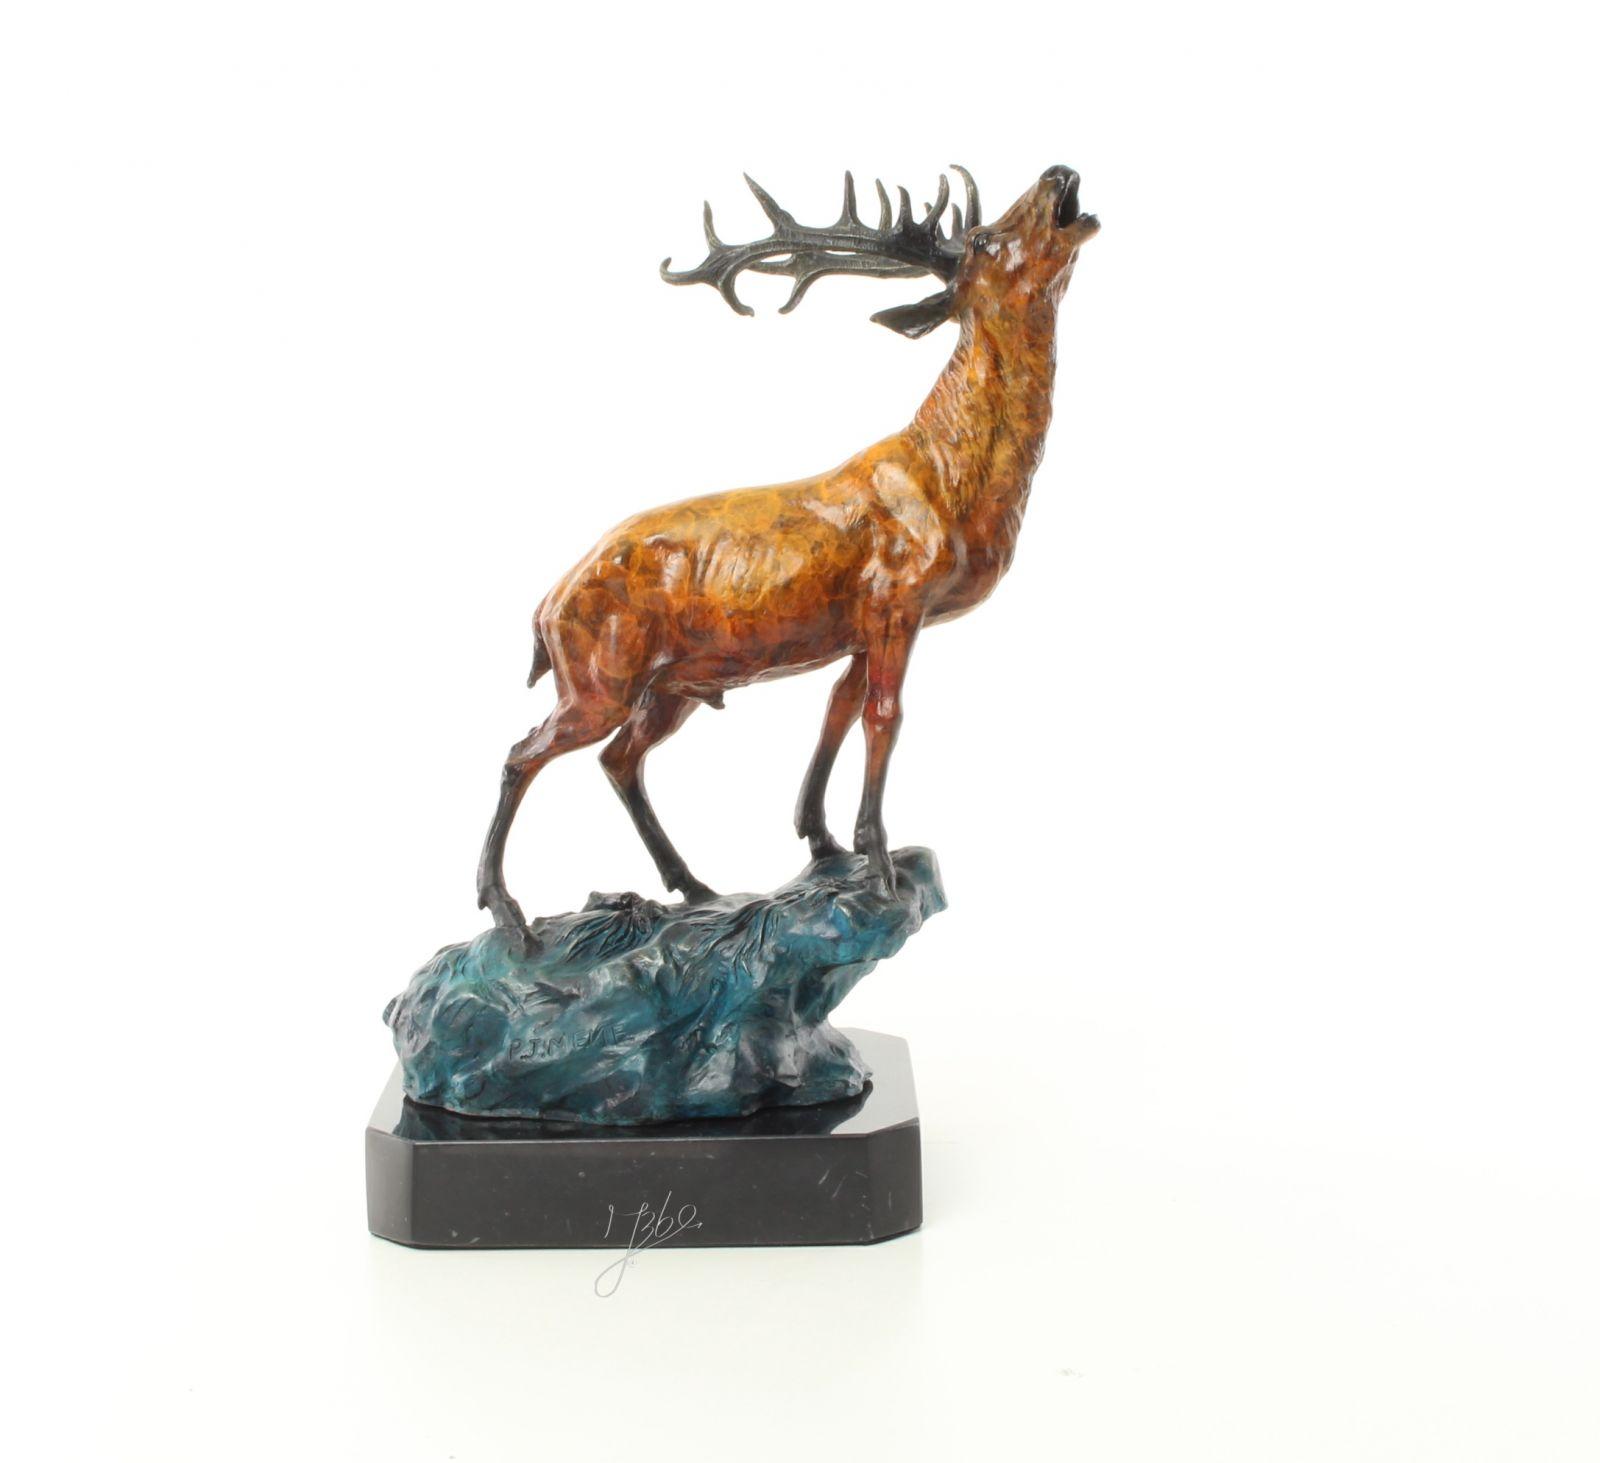 Jelen z bronzu socha Decosite